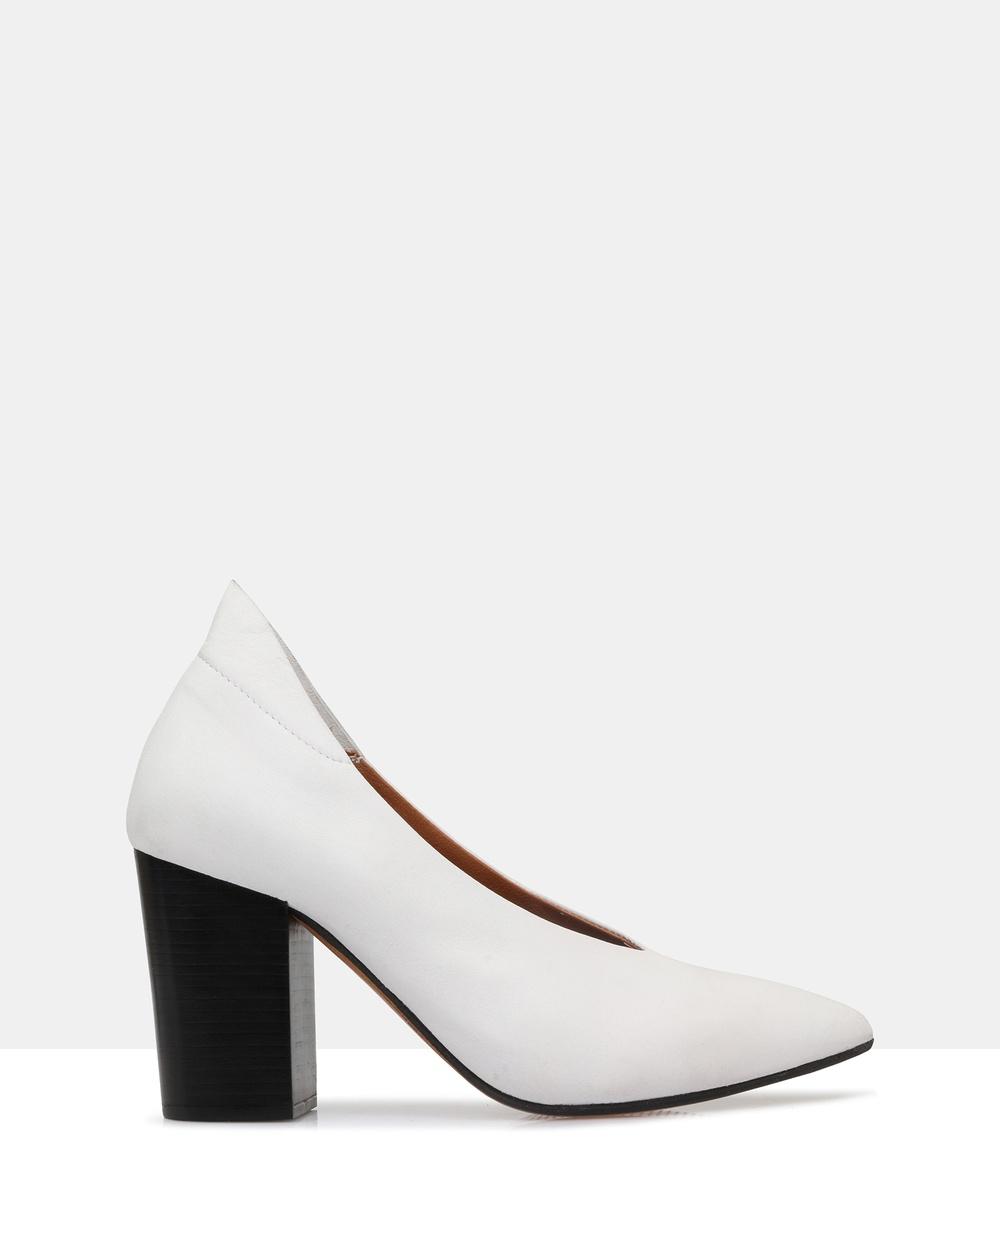 Sempre Di Paulette Heels All Pumps 003 Winter White Paulette Heels